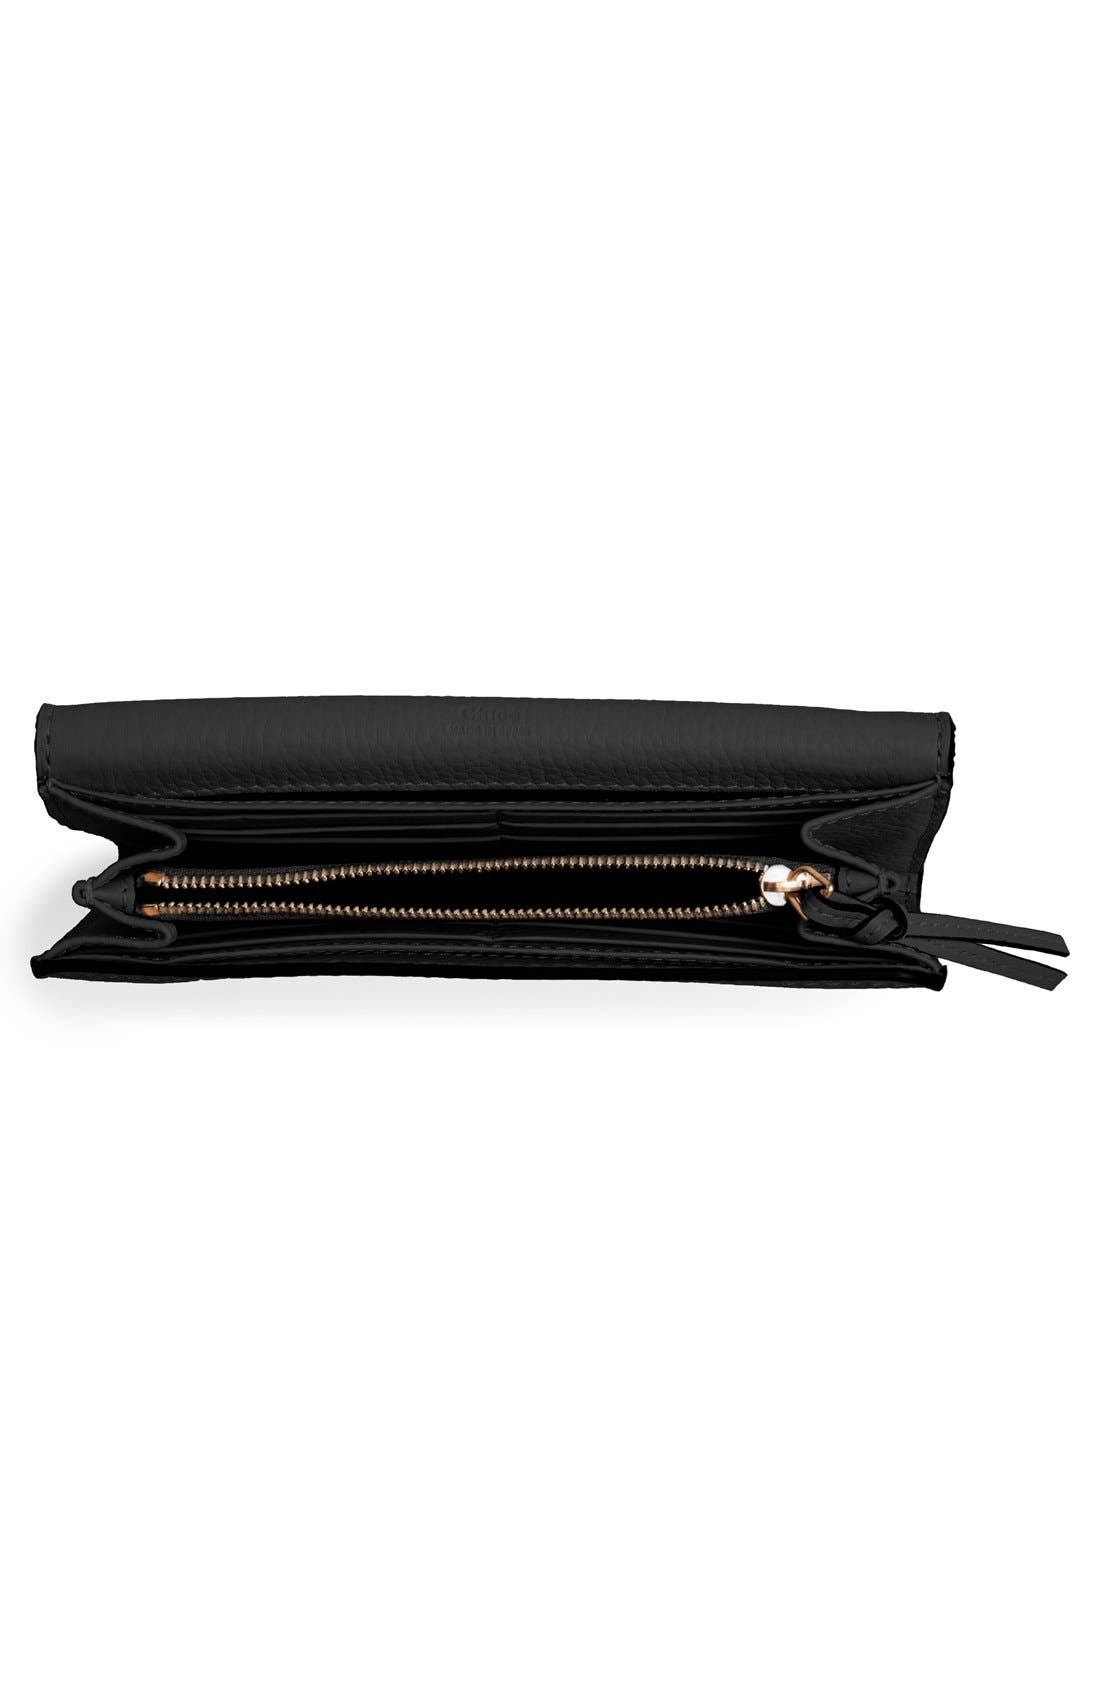 Marcie - Long Leather Flap Wallet,                             Alternate thumbnail 7, color,                             BLACK